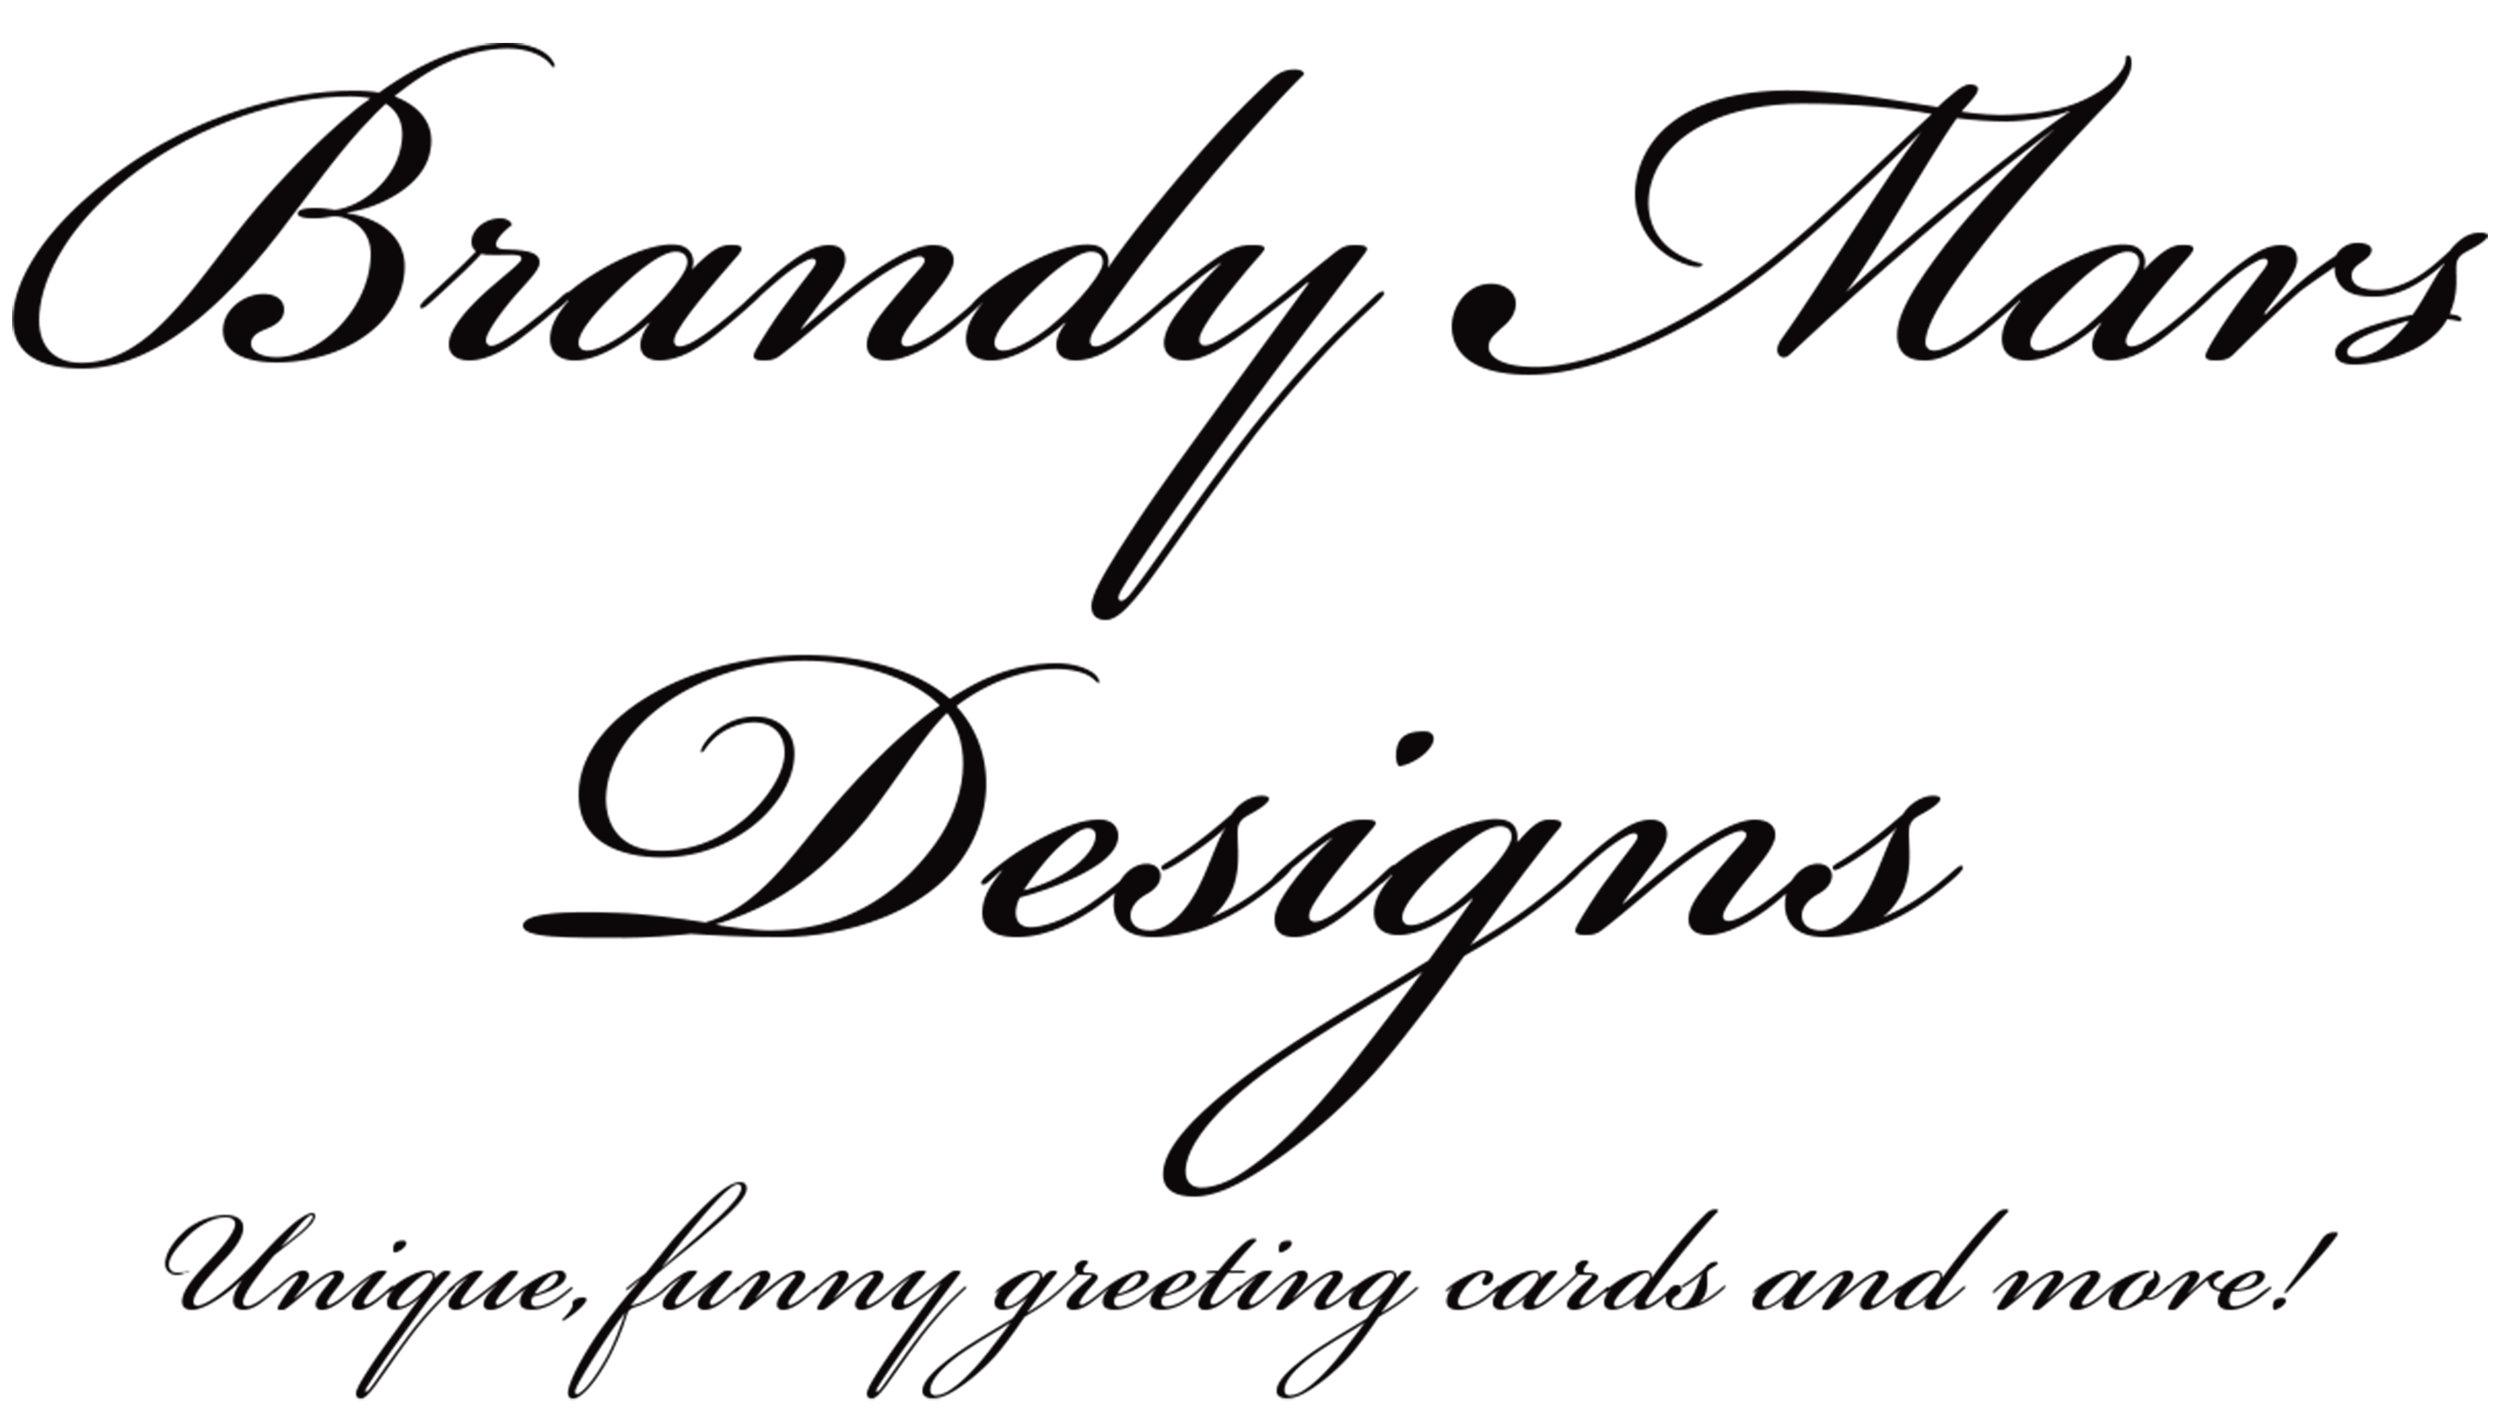 Brandy Mars Designs logo